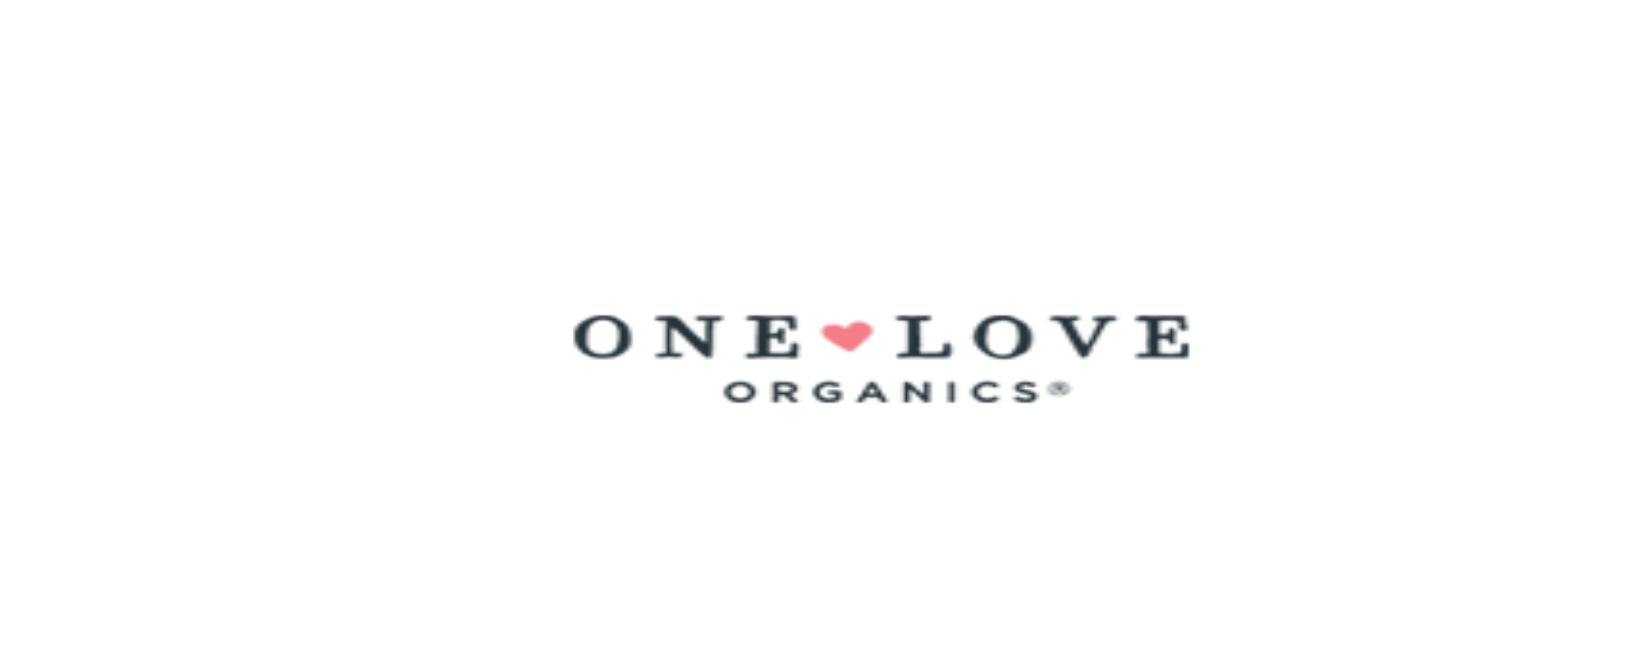 One Love Organics Discount Code 2021